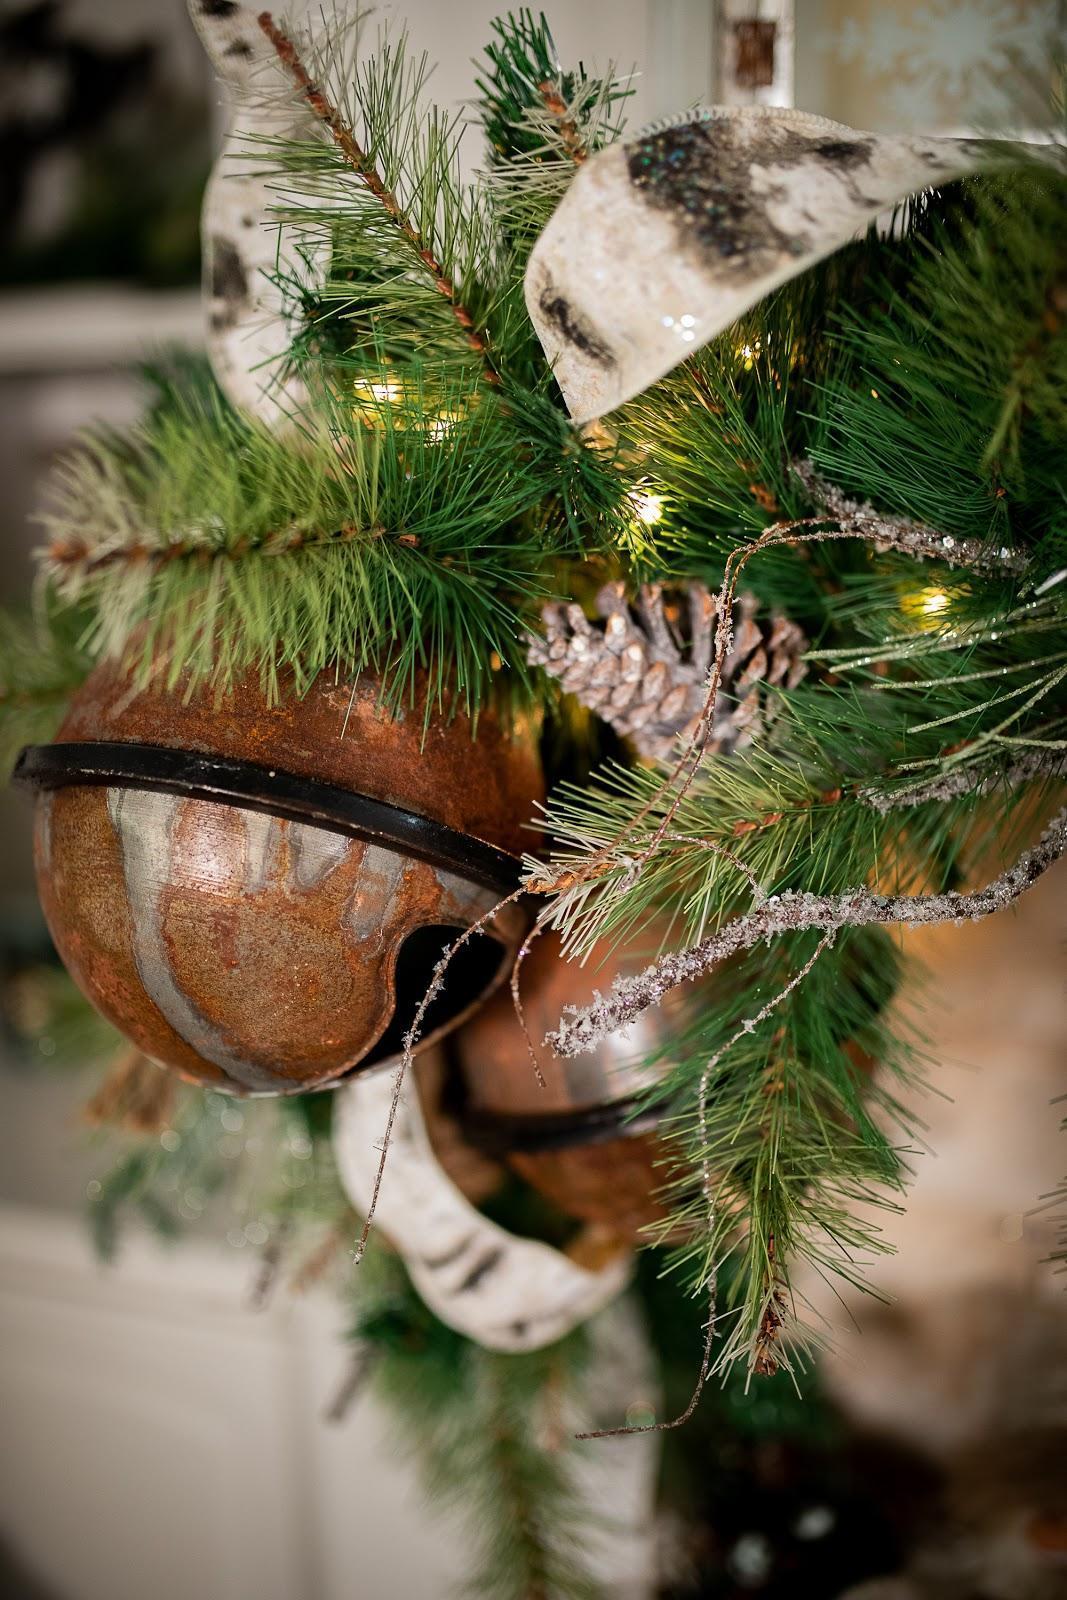 Christmas Decorating Trends 2020: μεταλλικά στολίδια στο χριστουγεννιάτικο δέντρο